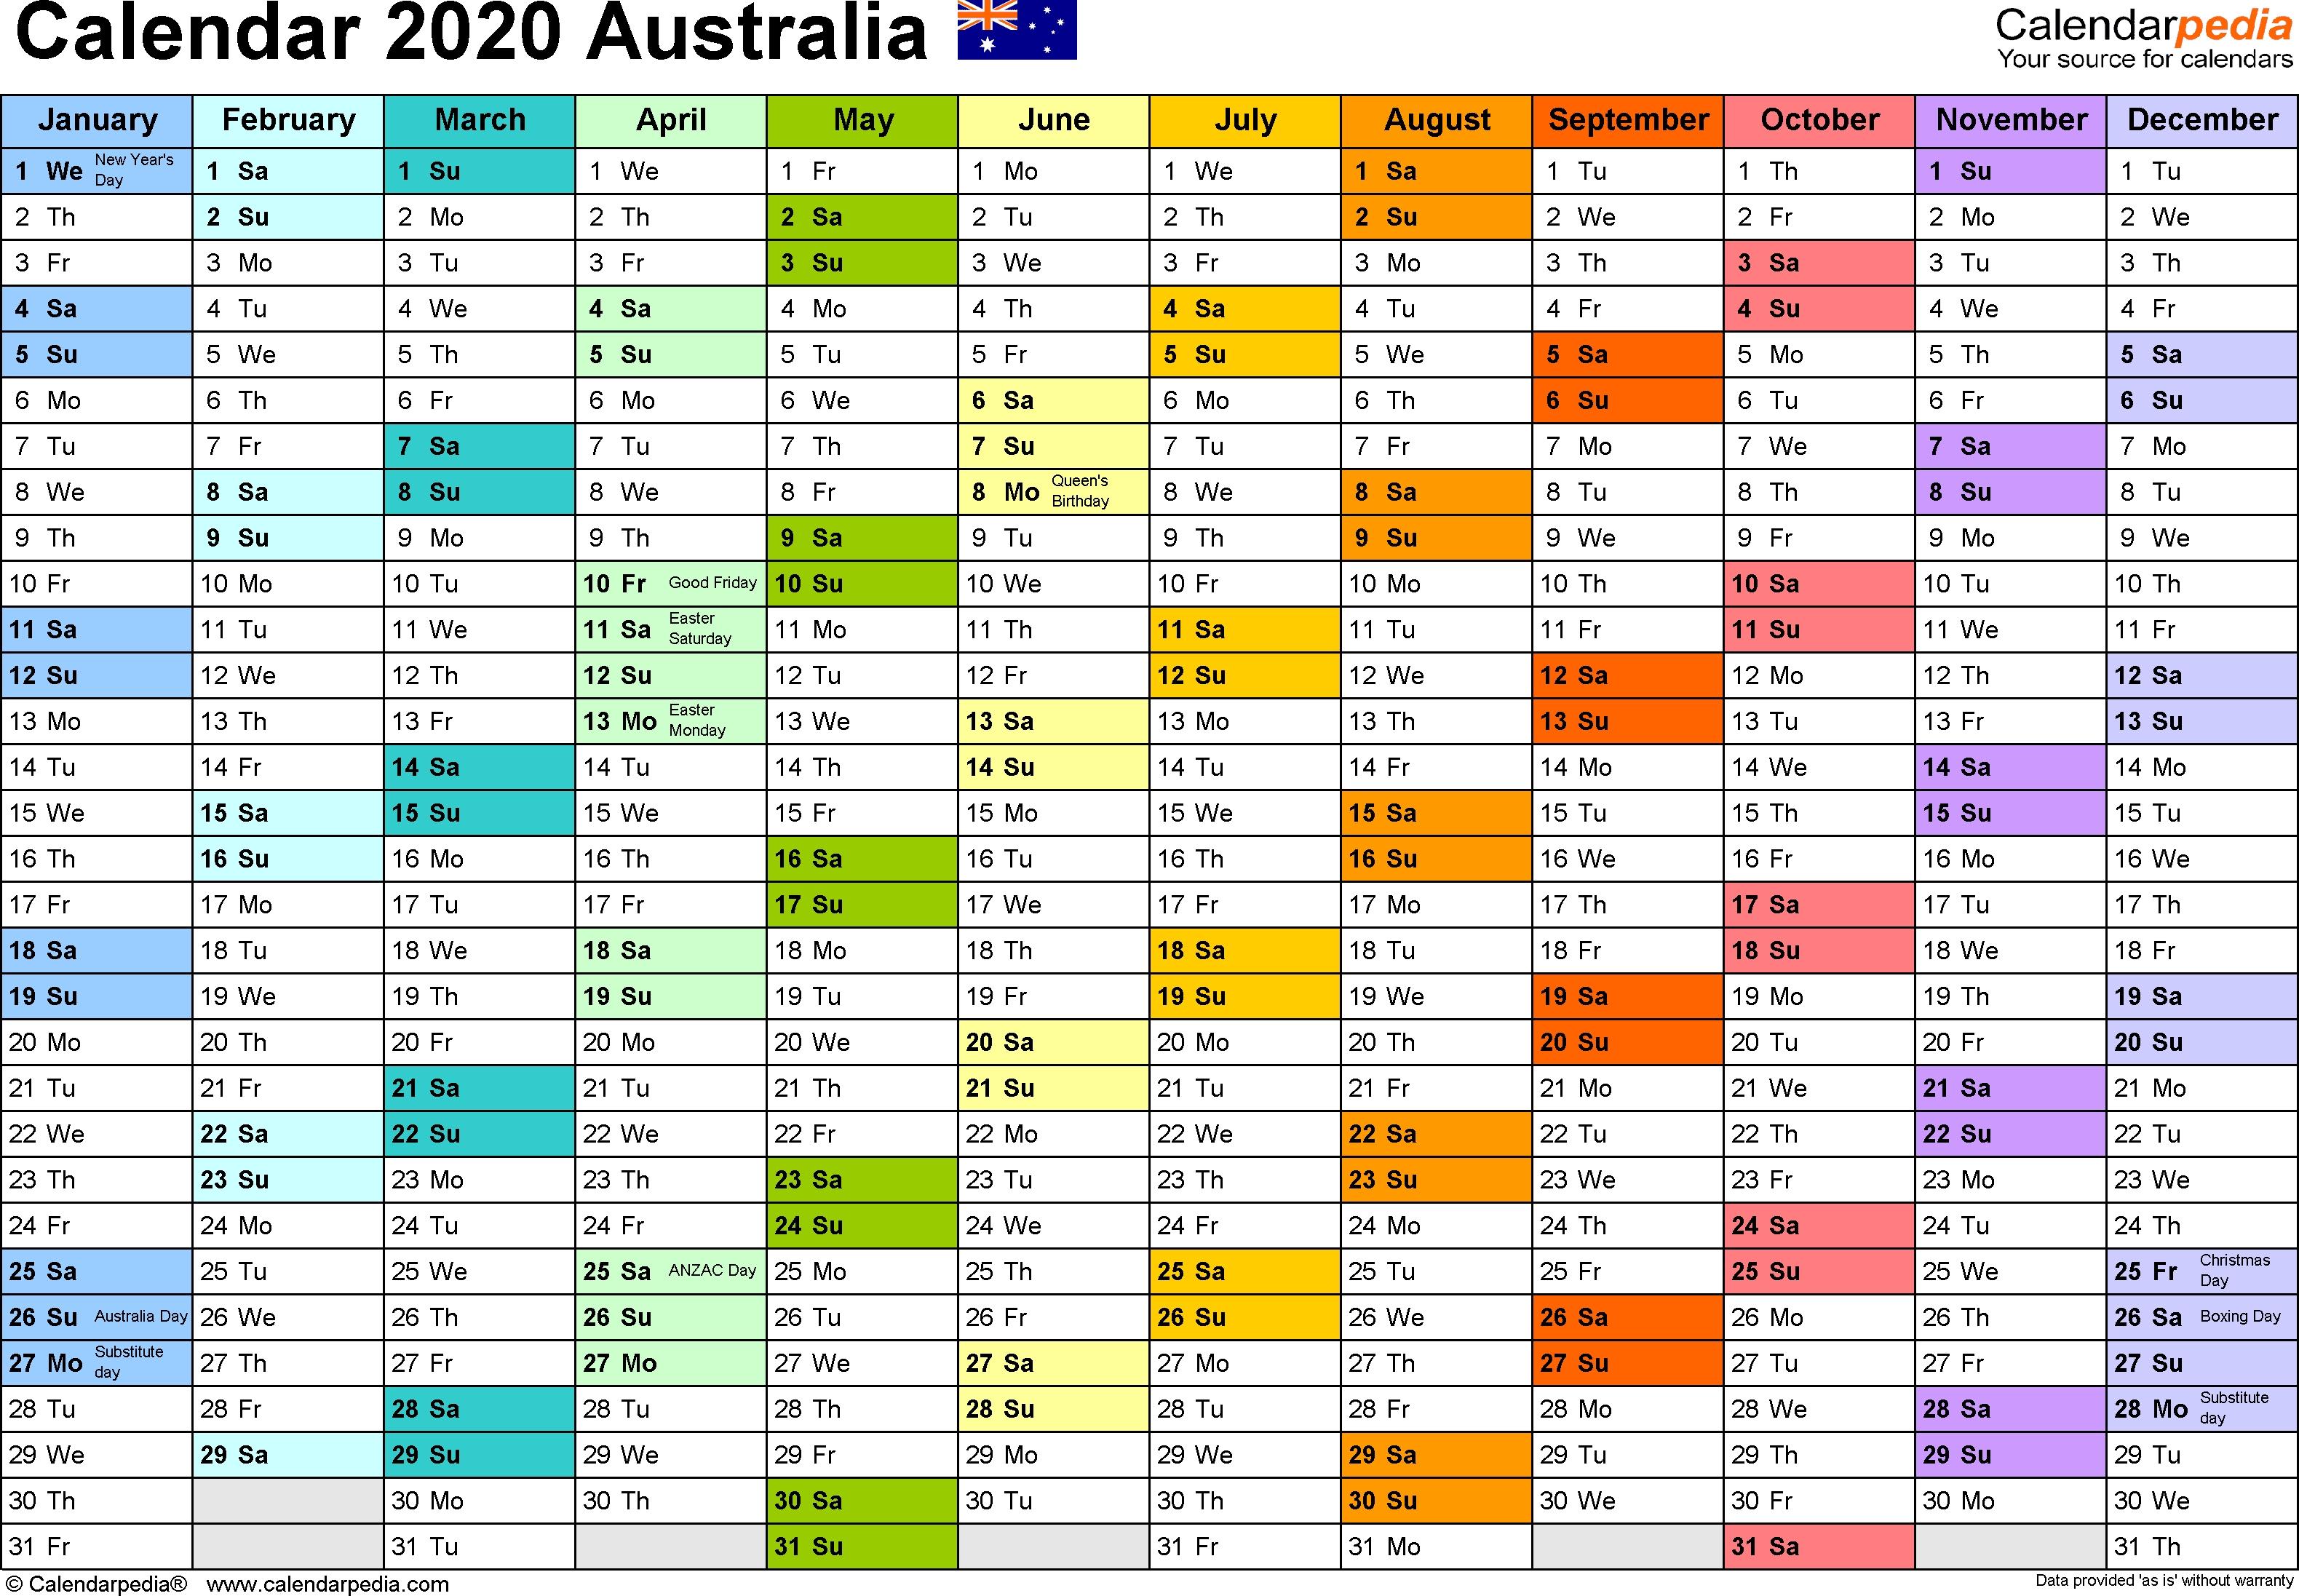 Australia Calendar 2020 - Free Printable Excel Templates-Fiscal Year 2020 Academic Calendar Template